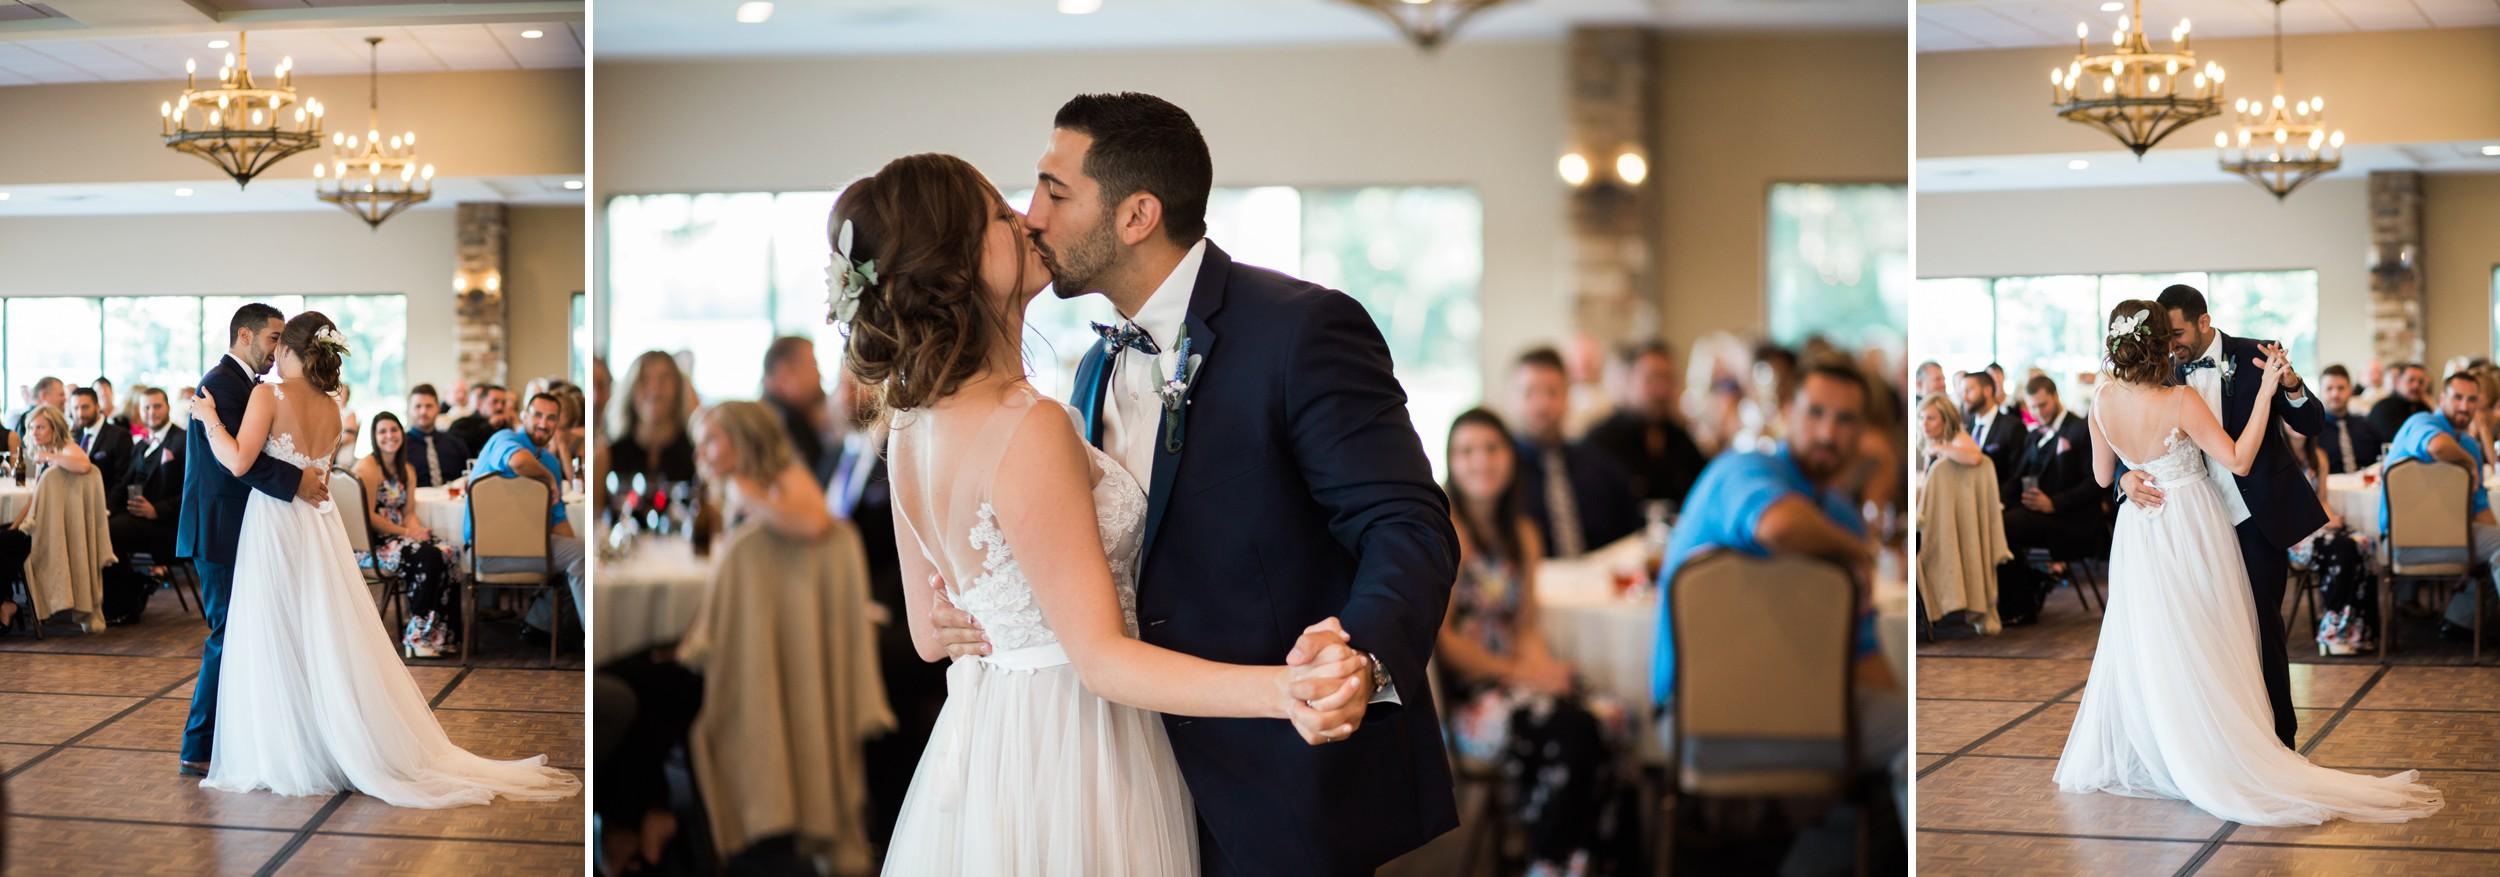 nick- and-martina-pine-lake-vinyards-tracylynn-photography-columbiana-ohio-wedding 6.jpg